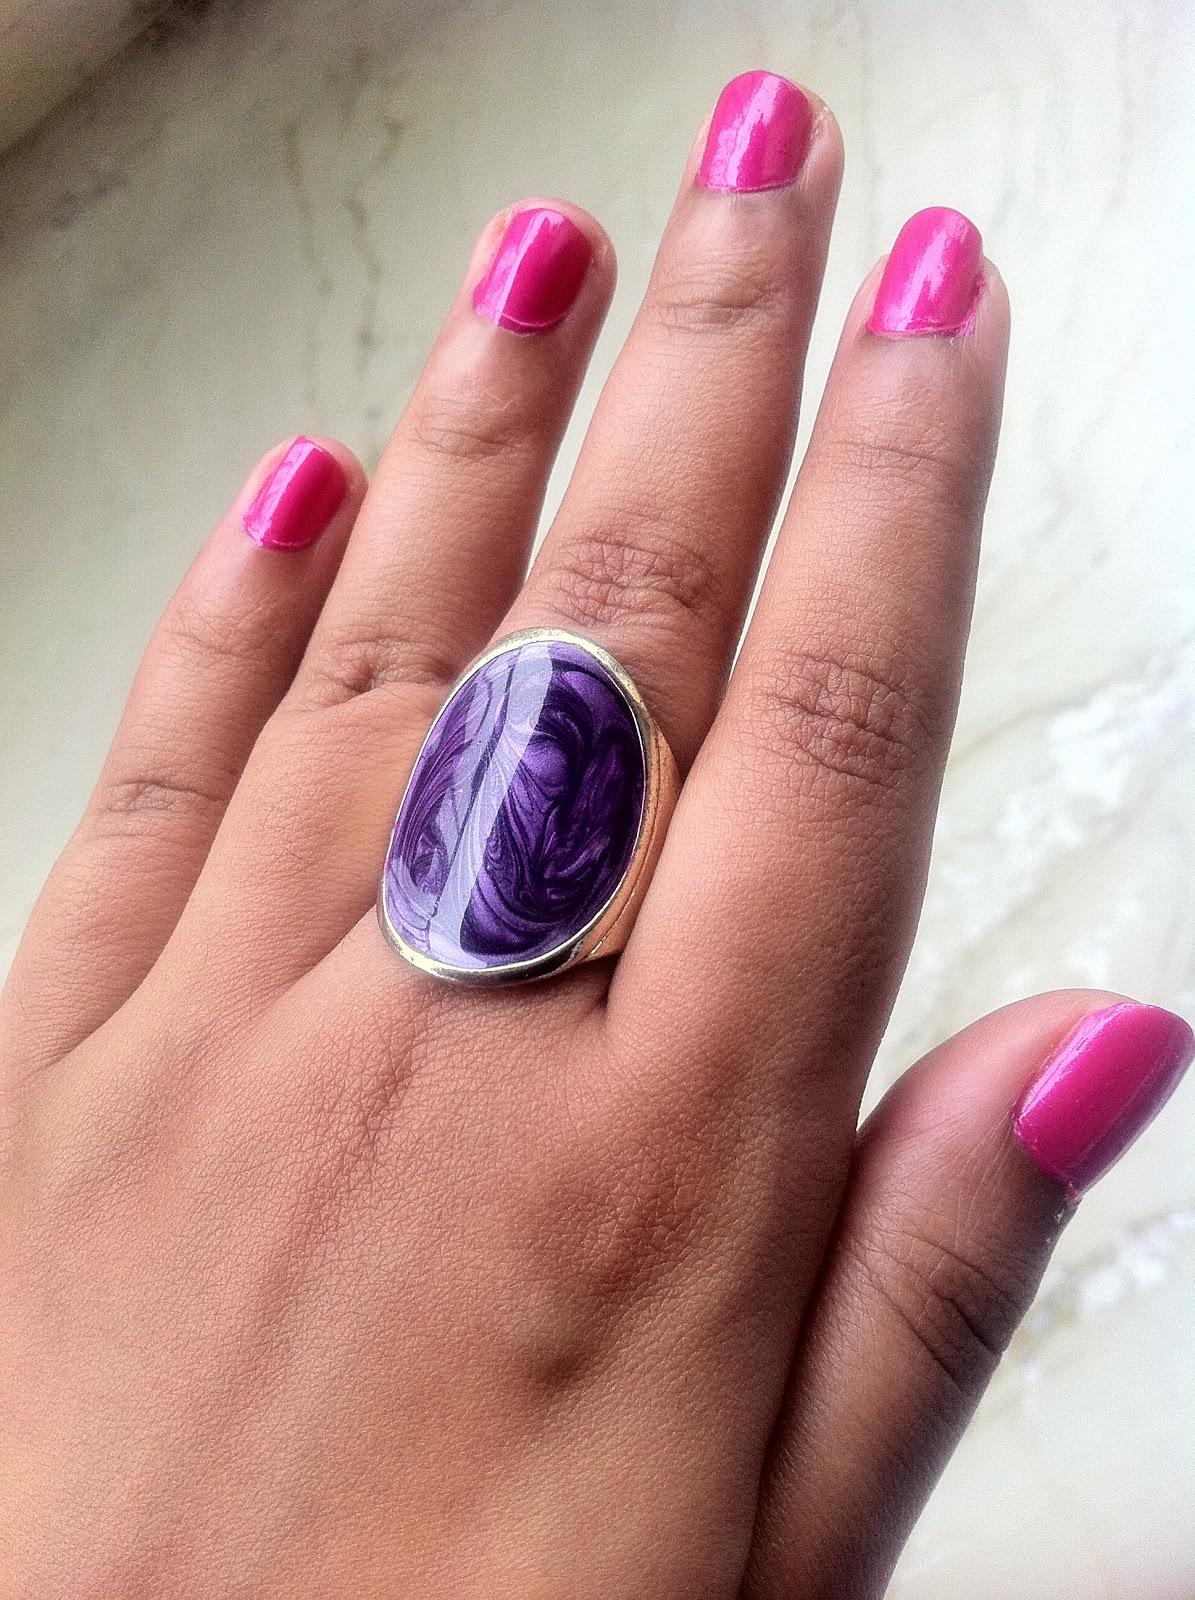 Flirtatious Nails In 2019: Avon's Color Me Pretty Nail Enamel In